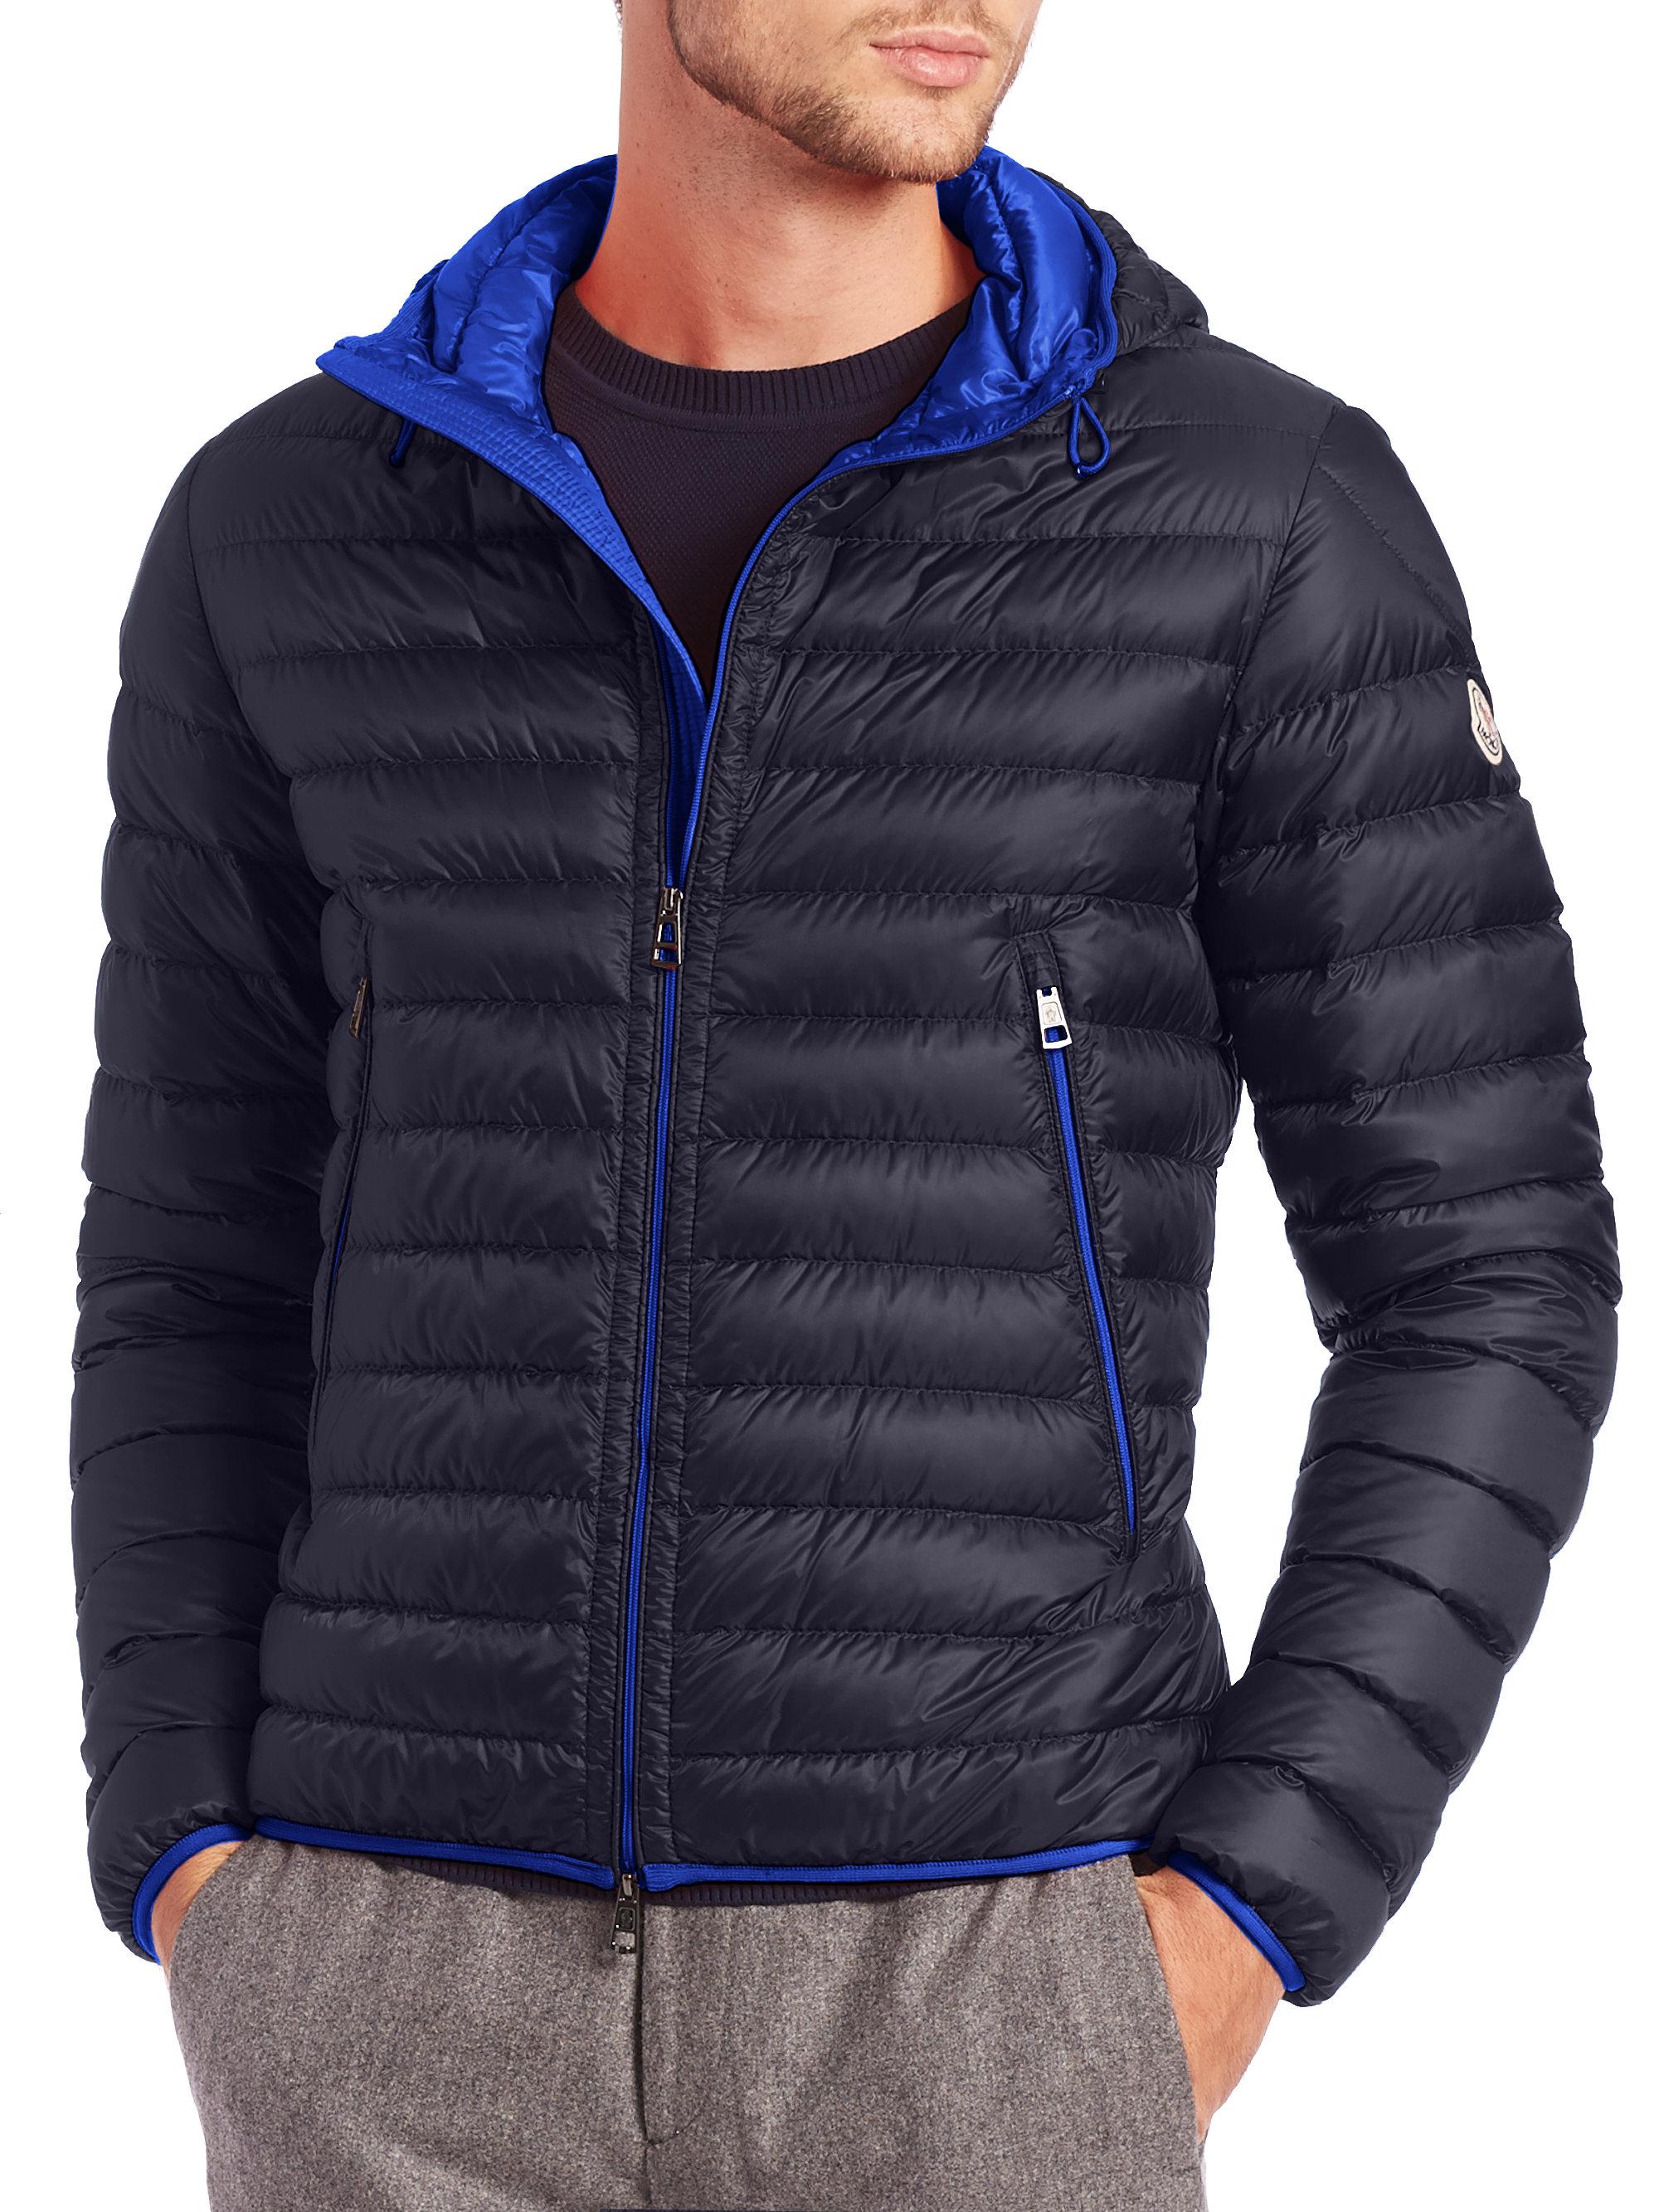 ccc5464b2 order moncler puffer jacket blue 64697 06ed7